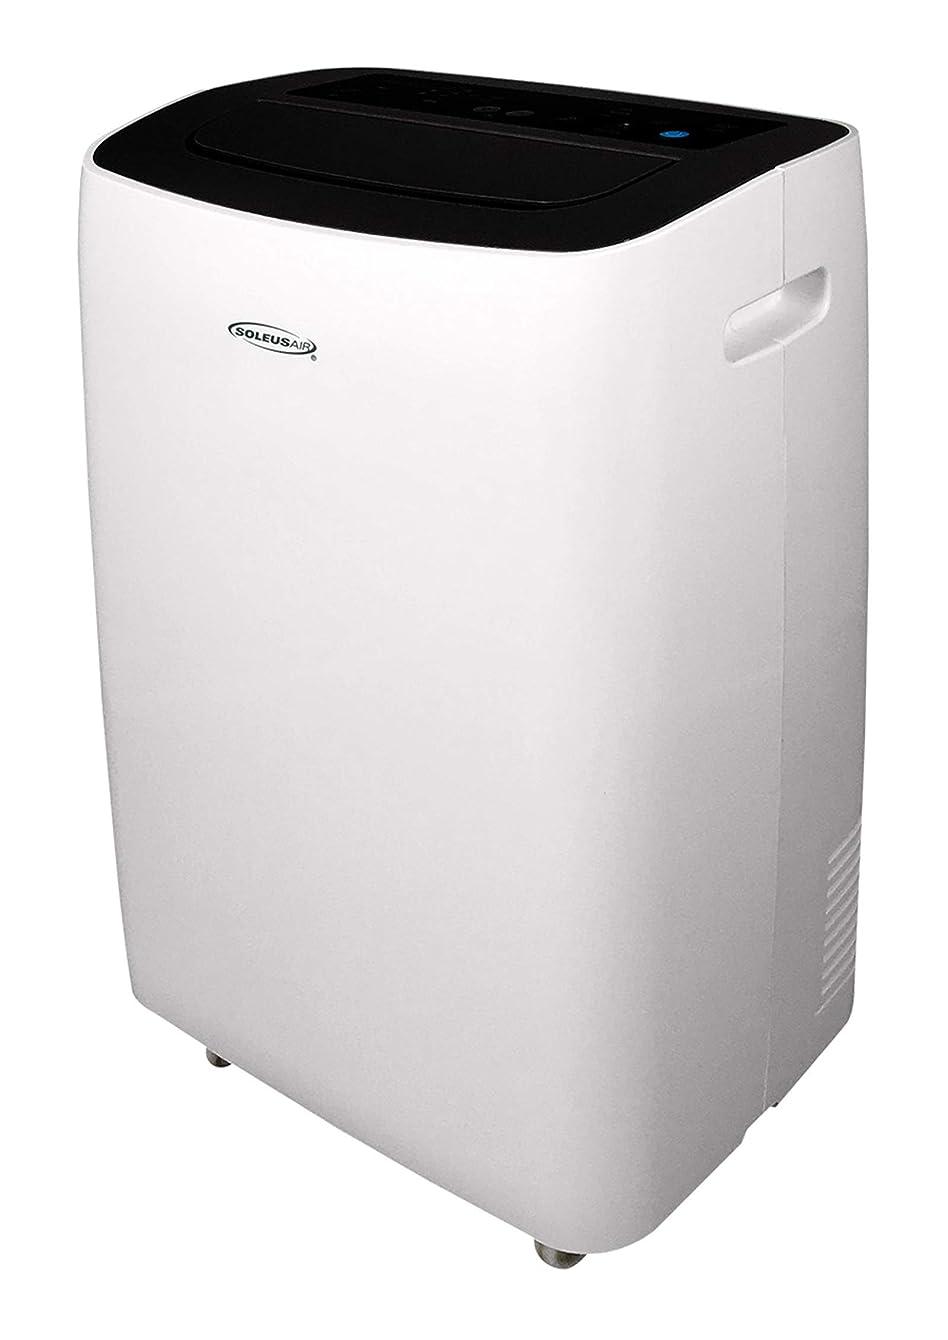 SoleusAir 10,000 BTU Portable Air Conditioner with MyTemp Remote Control, White